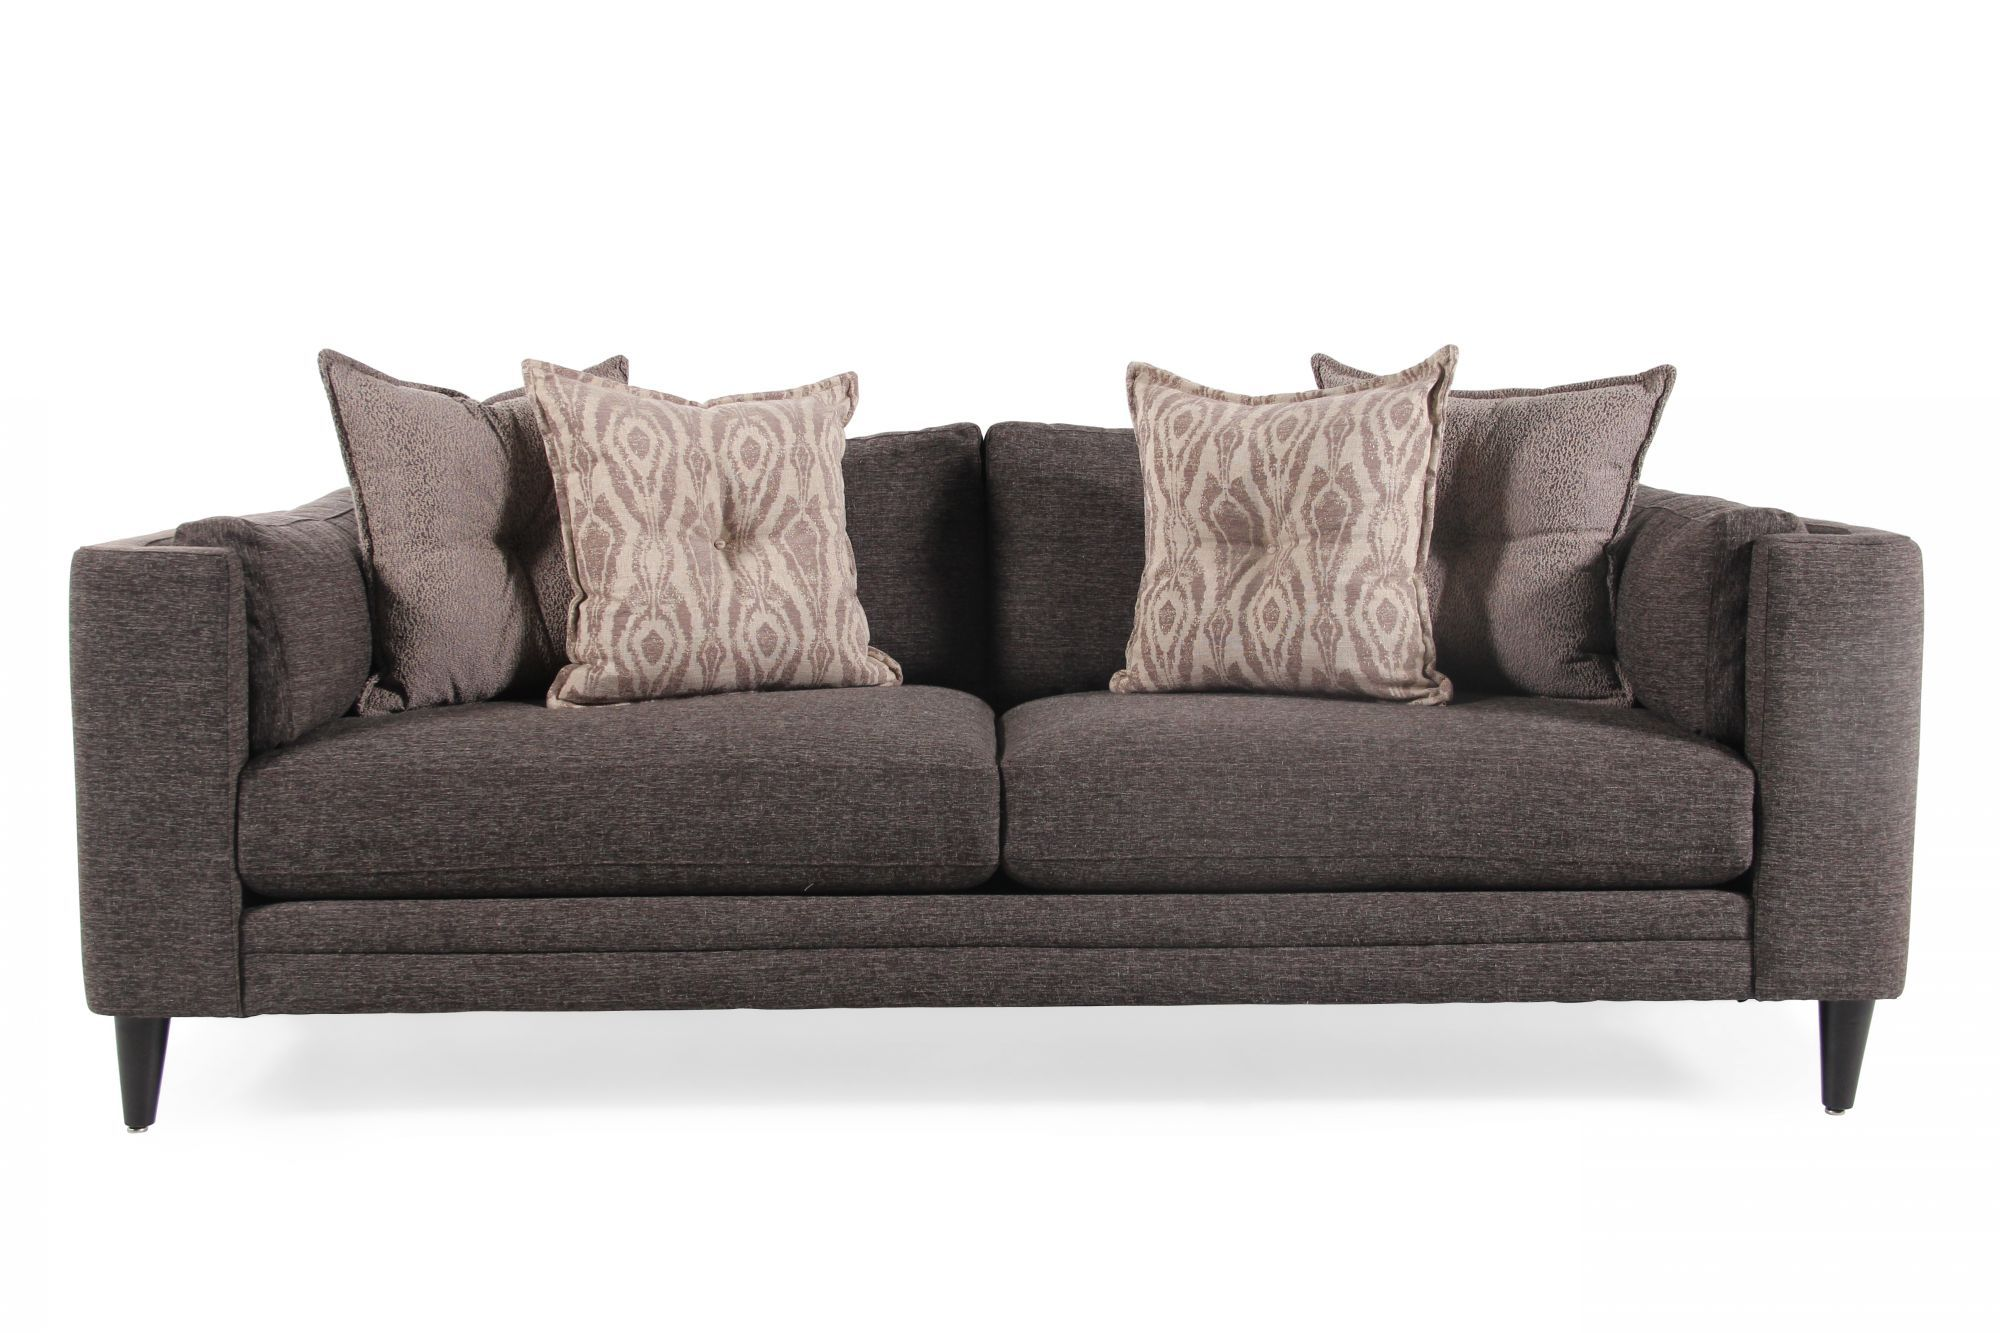 Jonathan Louis Sofa Bed Super Deep Sectional Isaac Mathis Brothers Furniture 886